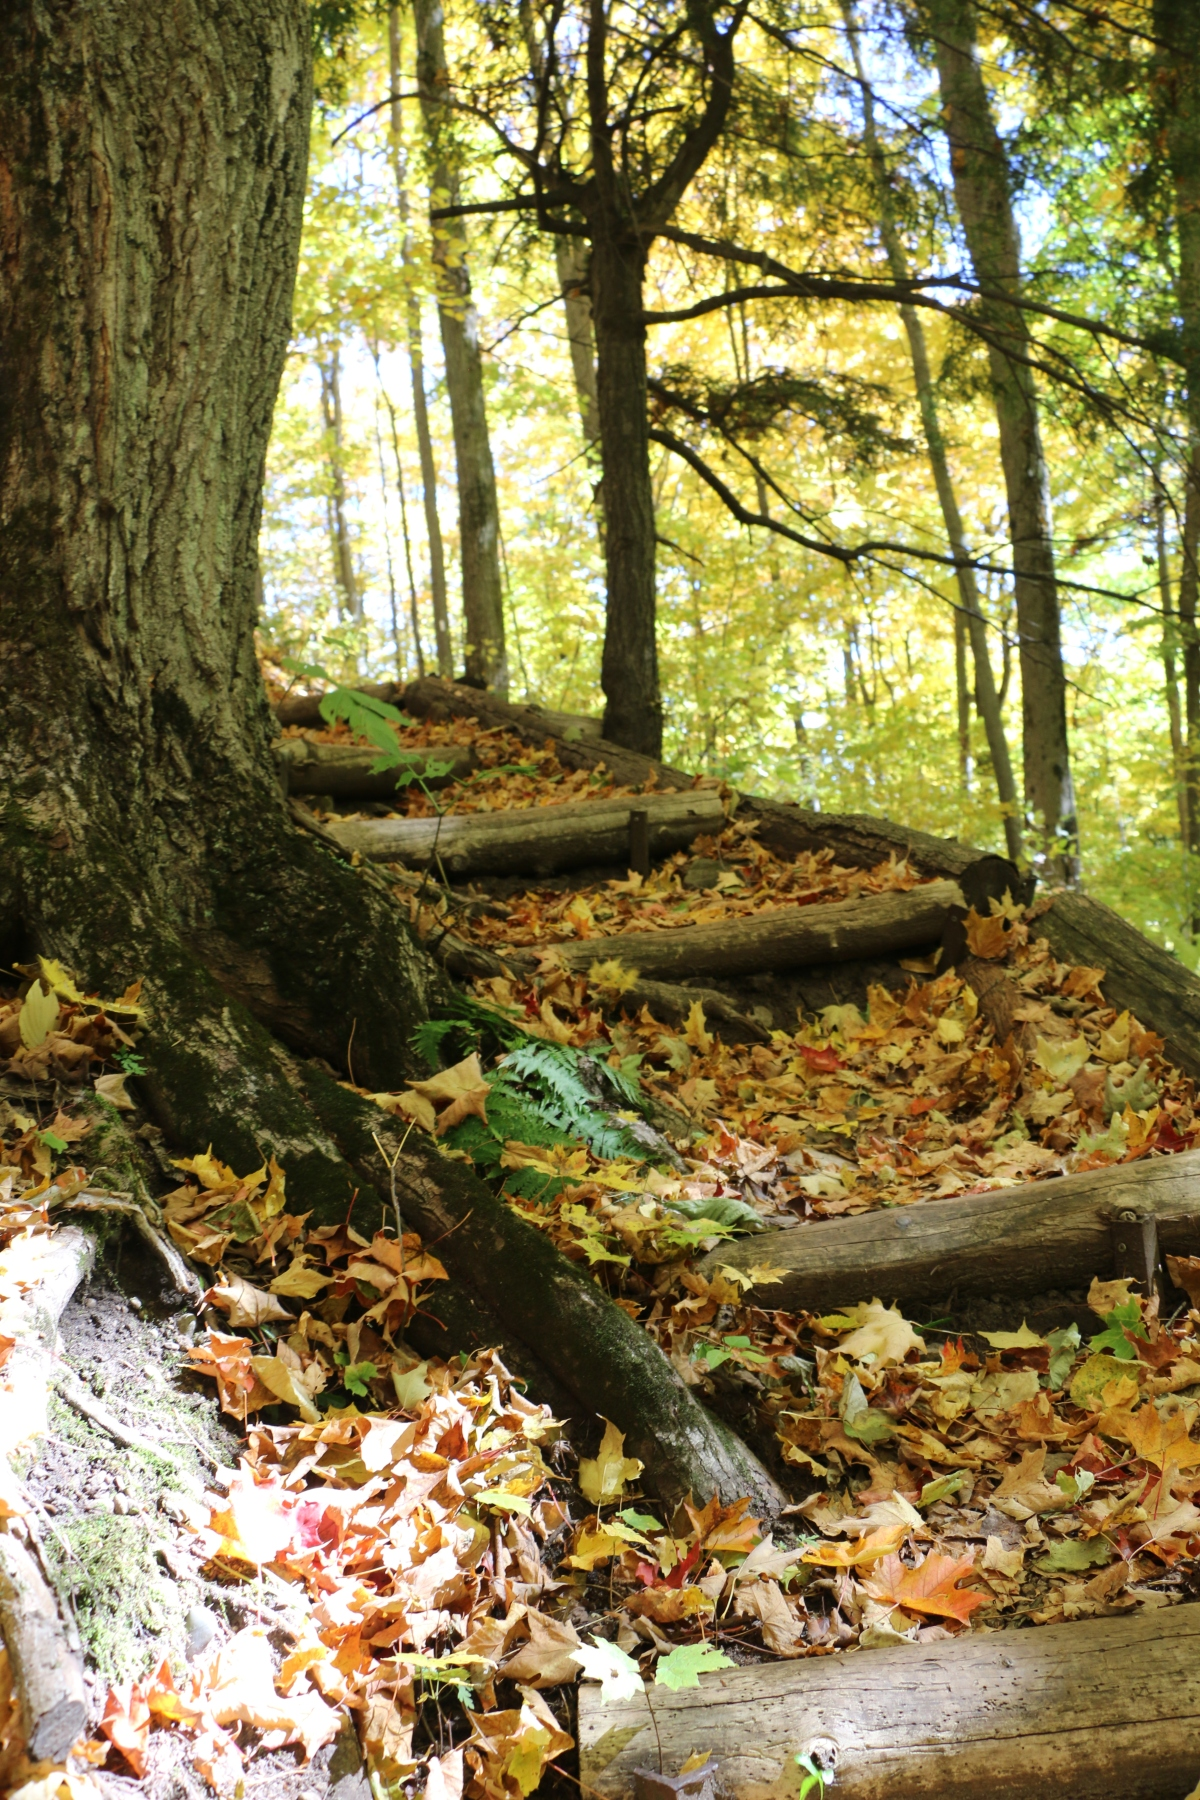 Thanksgiving Hike AT Boyne Valley ProvincialPark